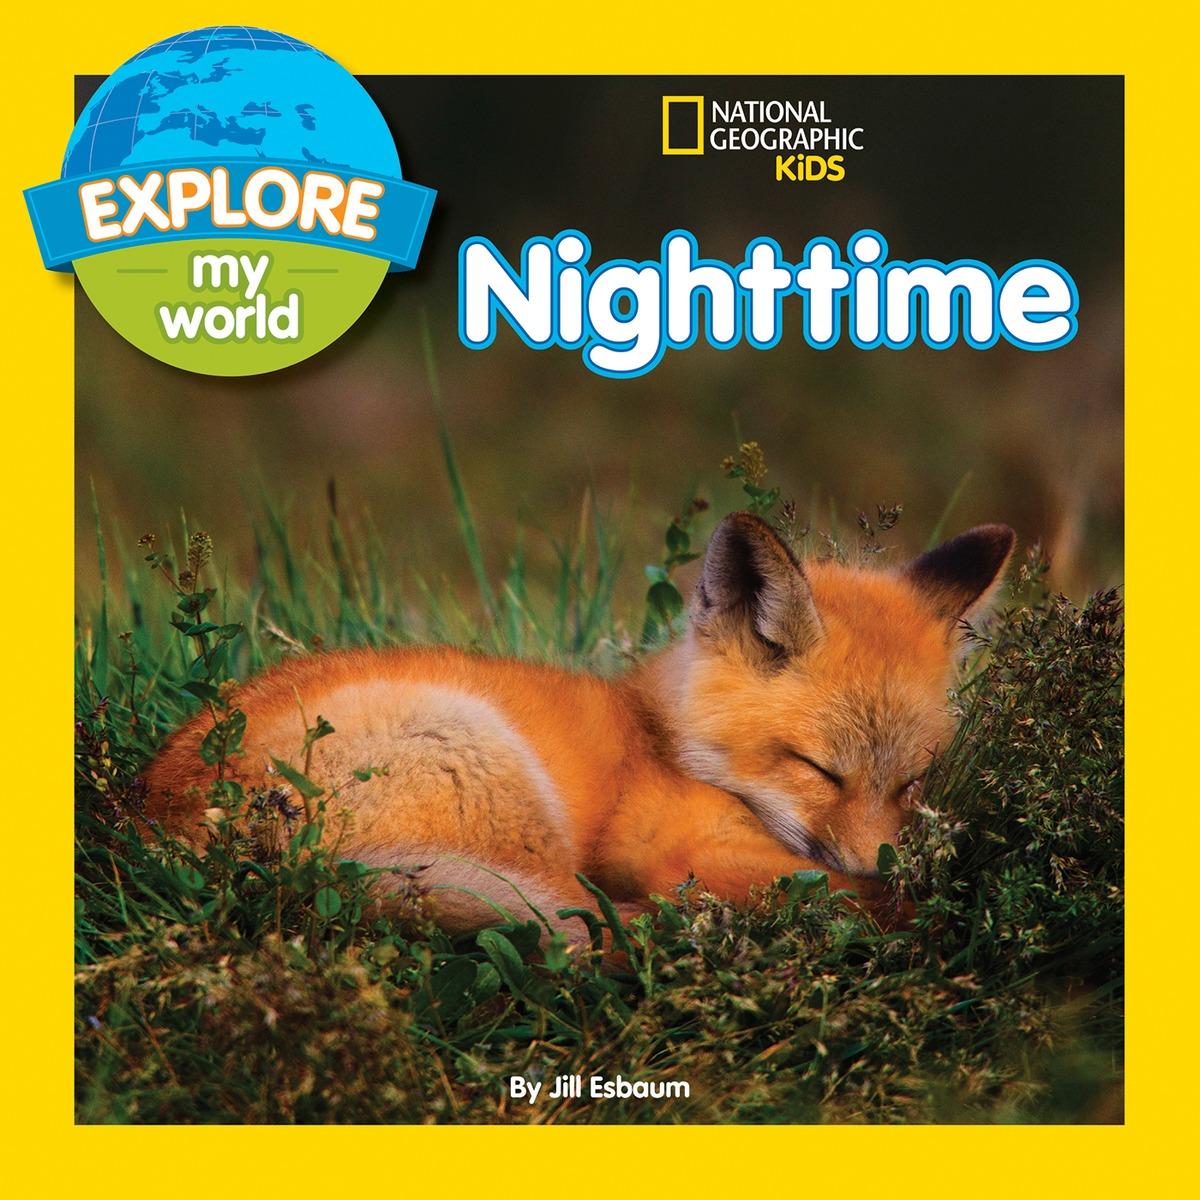 EXPLORE MY WORLD NIGHTTIME esbaum jill explore my world nighttime